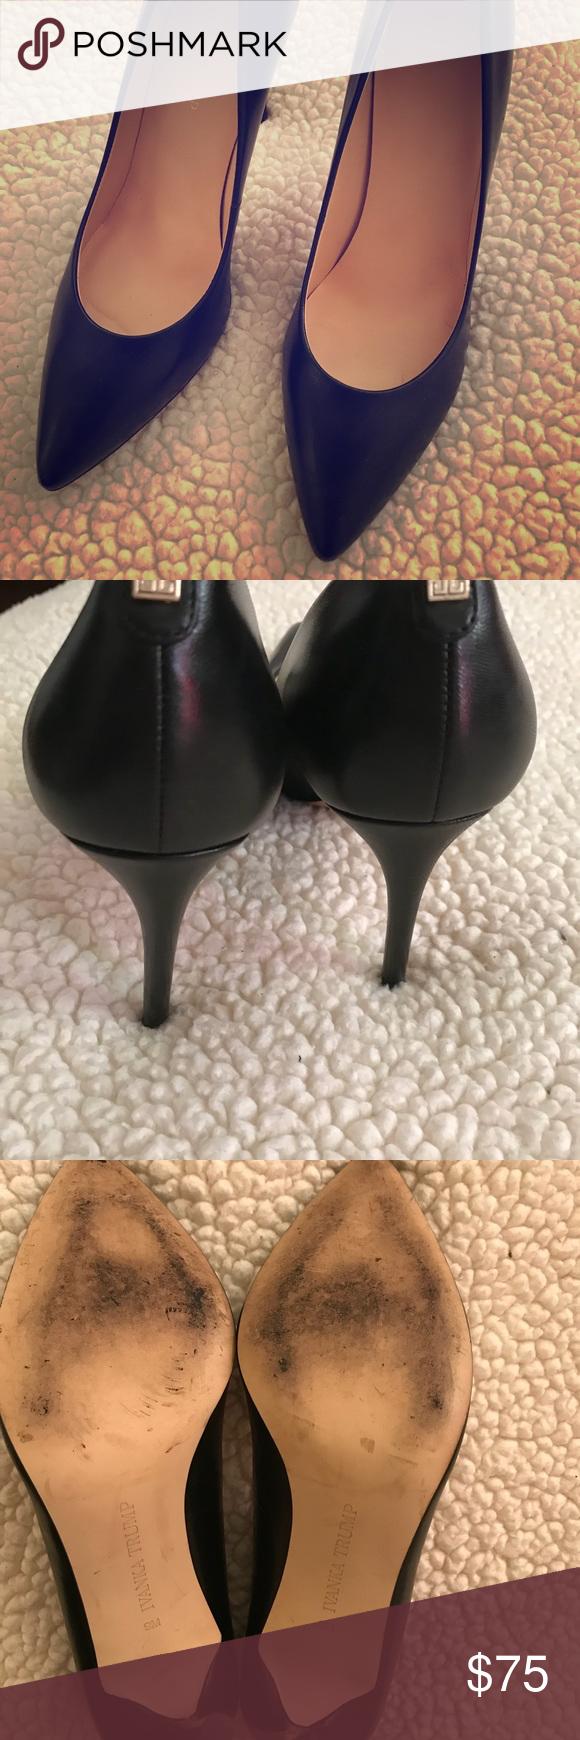 Ivanka Trump pointed toe black leather pump Barely worn black pump, stylish and sleek wear with jeans, slacks or formal wear. Ivanka Trump Shoes Heels